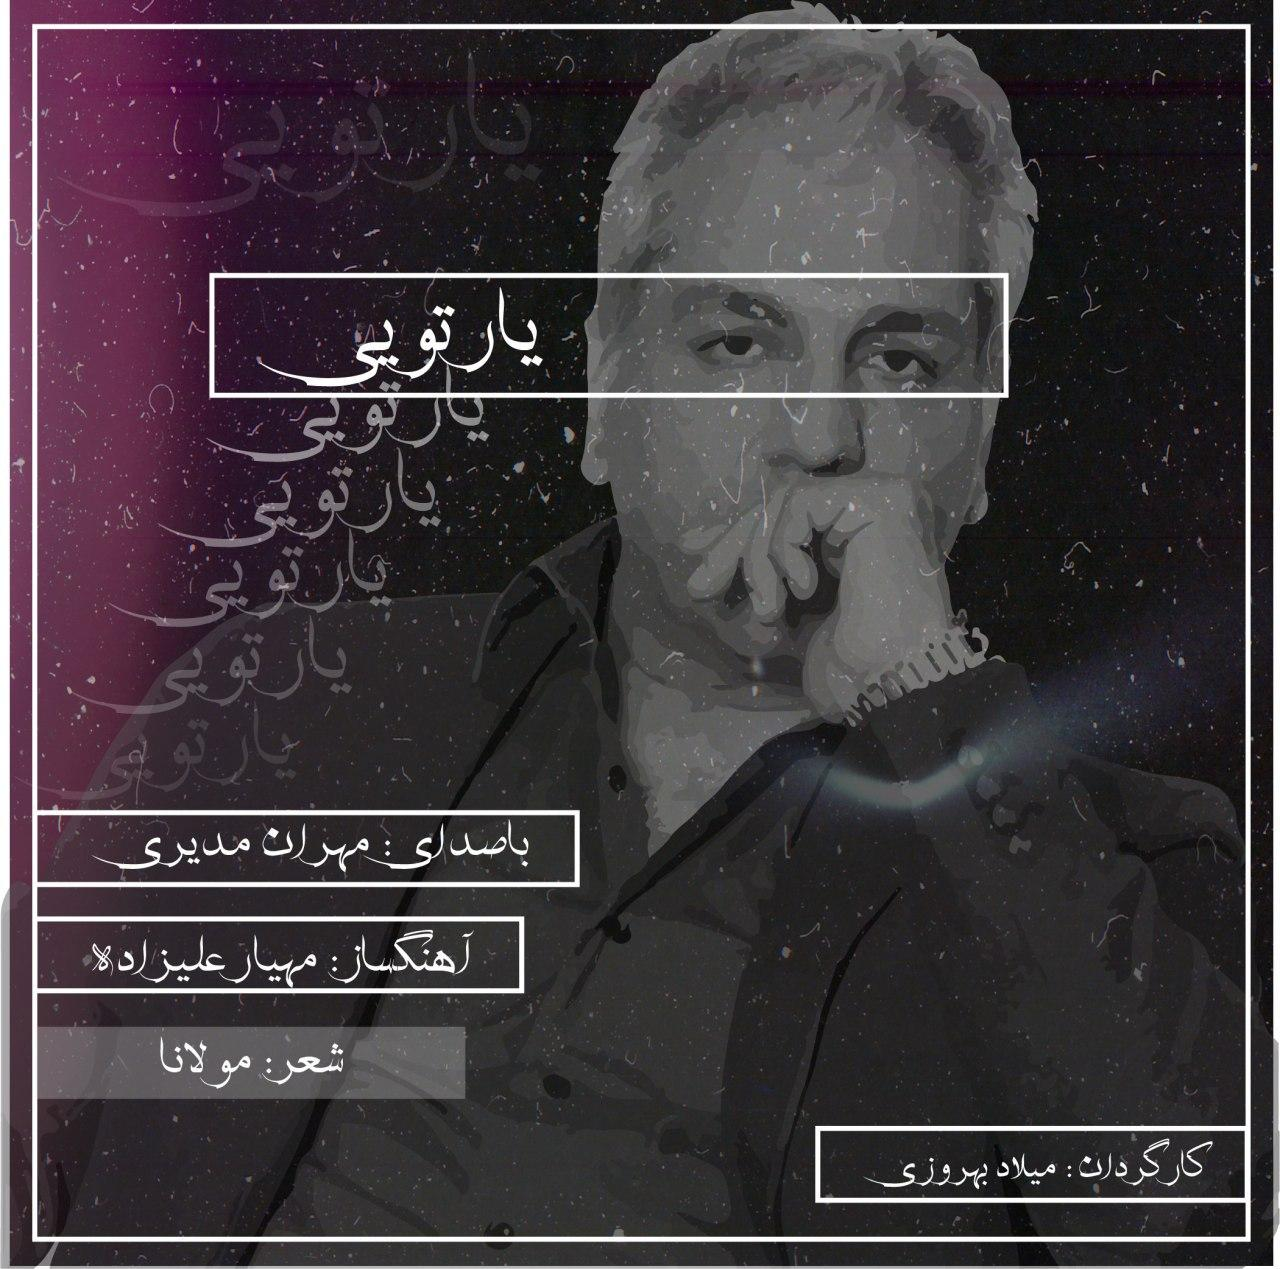 Mehran Modiri – Yar Toyi (Official Video)